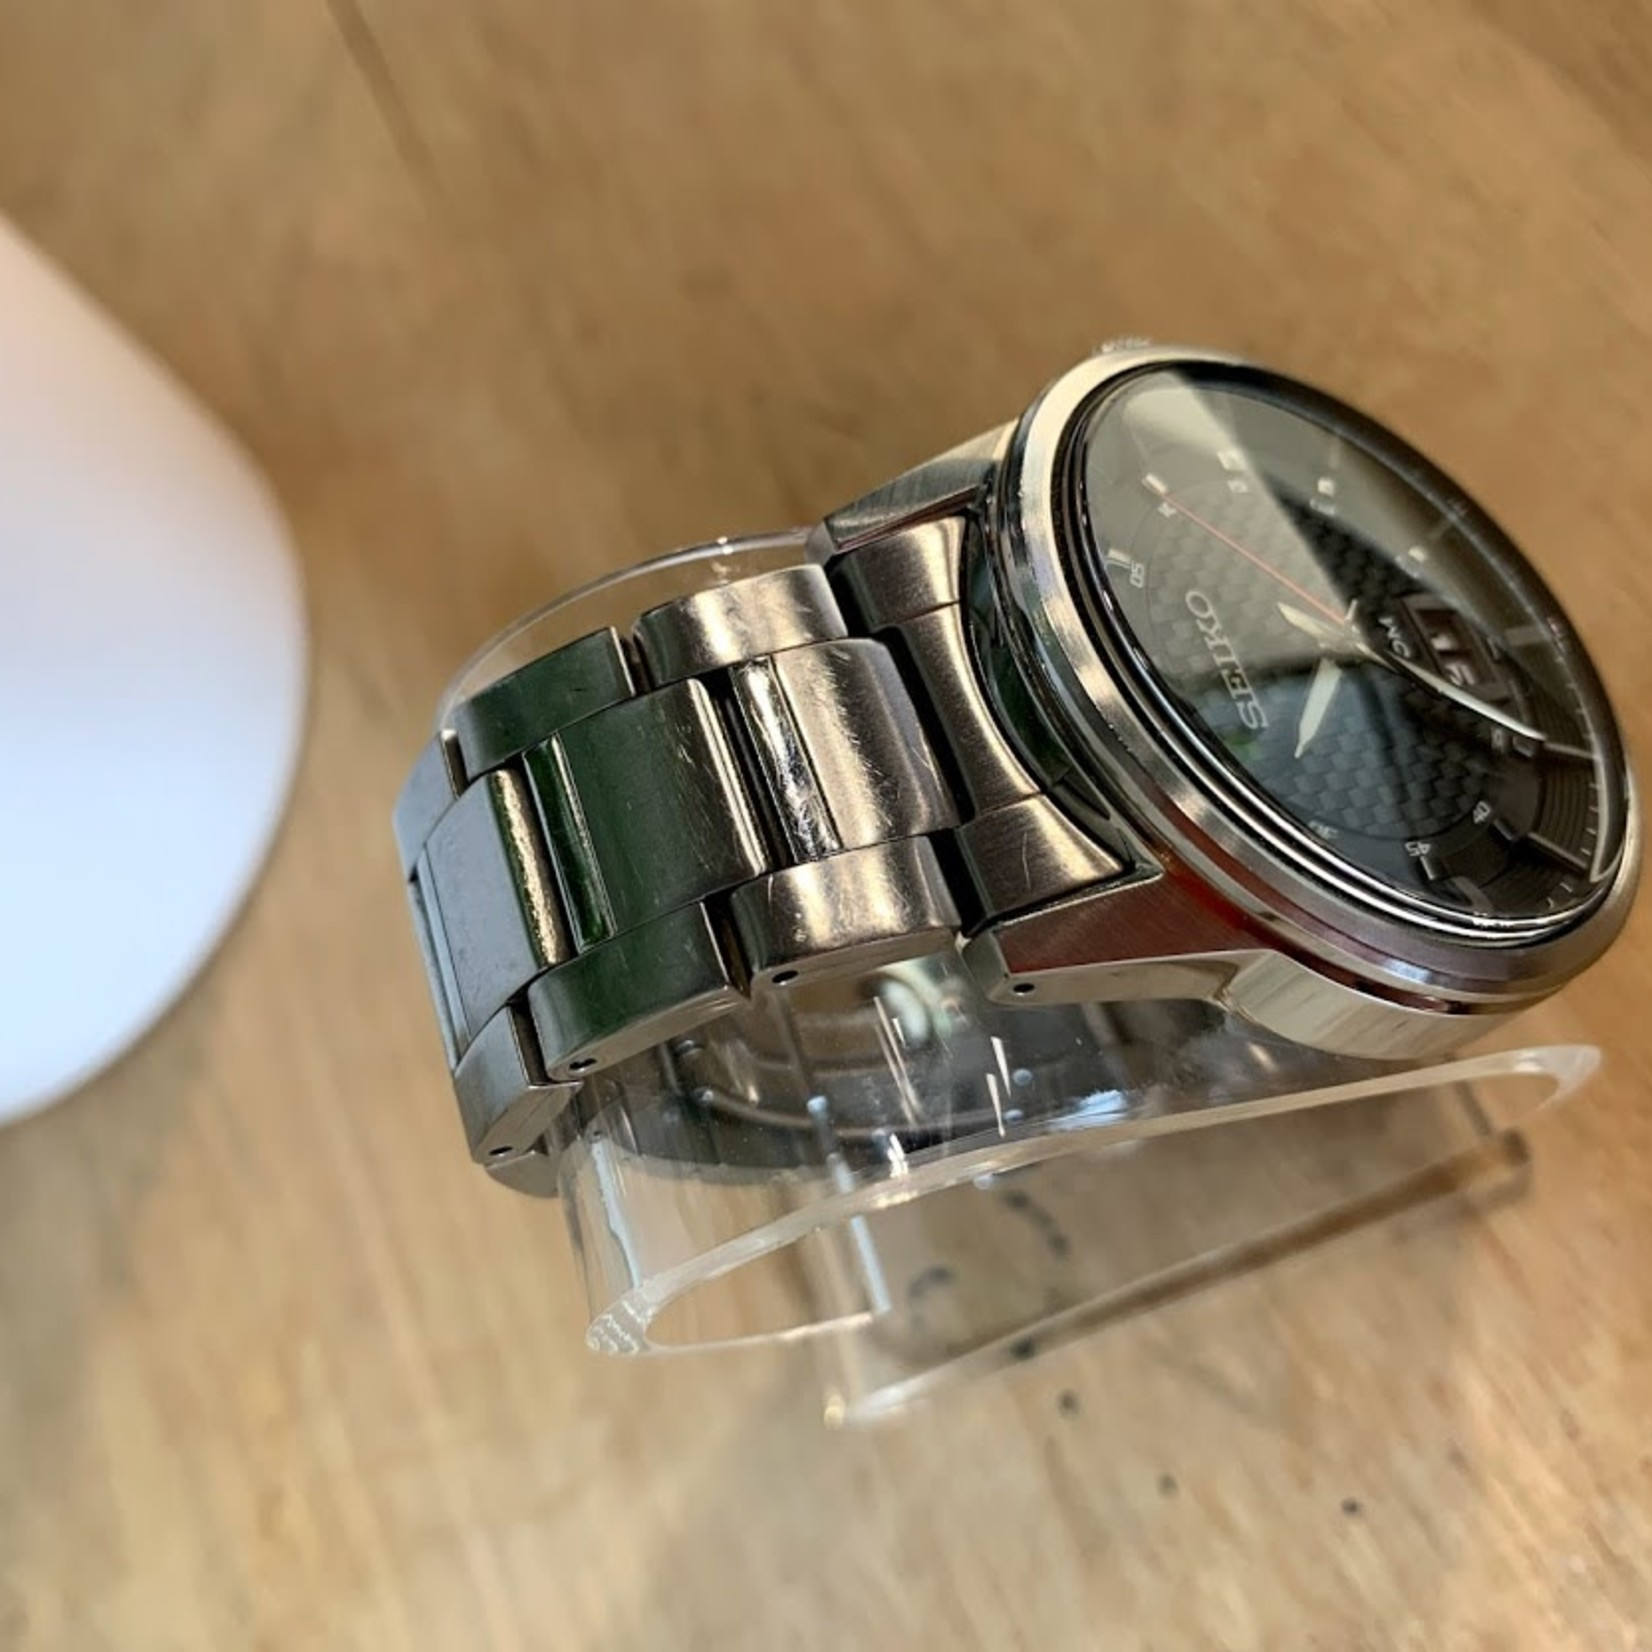 Seiko Men's Black Dial Watch SEIKO 6N76-00H0  *Signs of wear on wrist strap